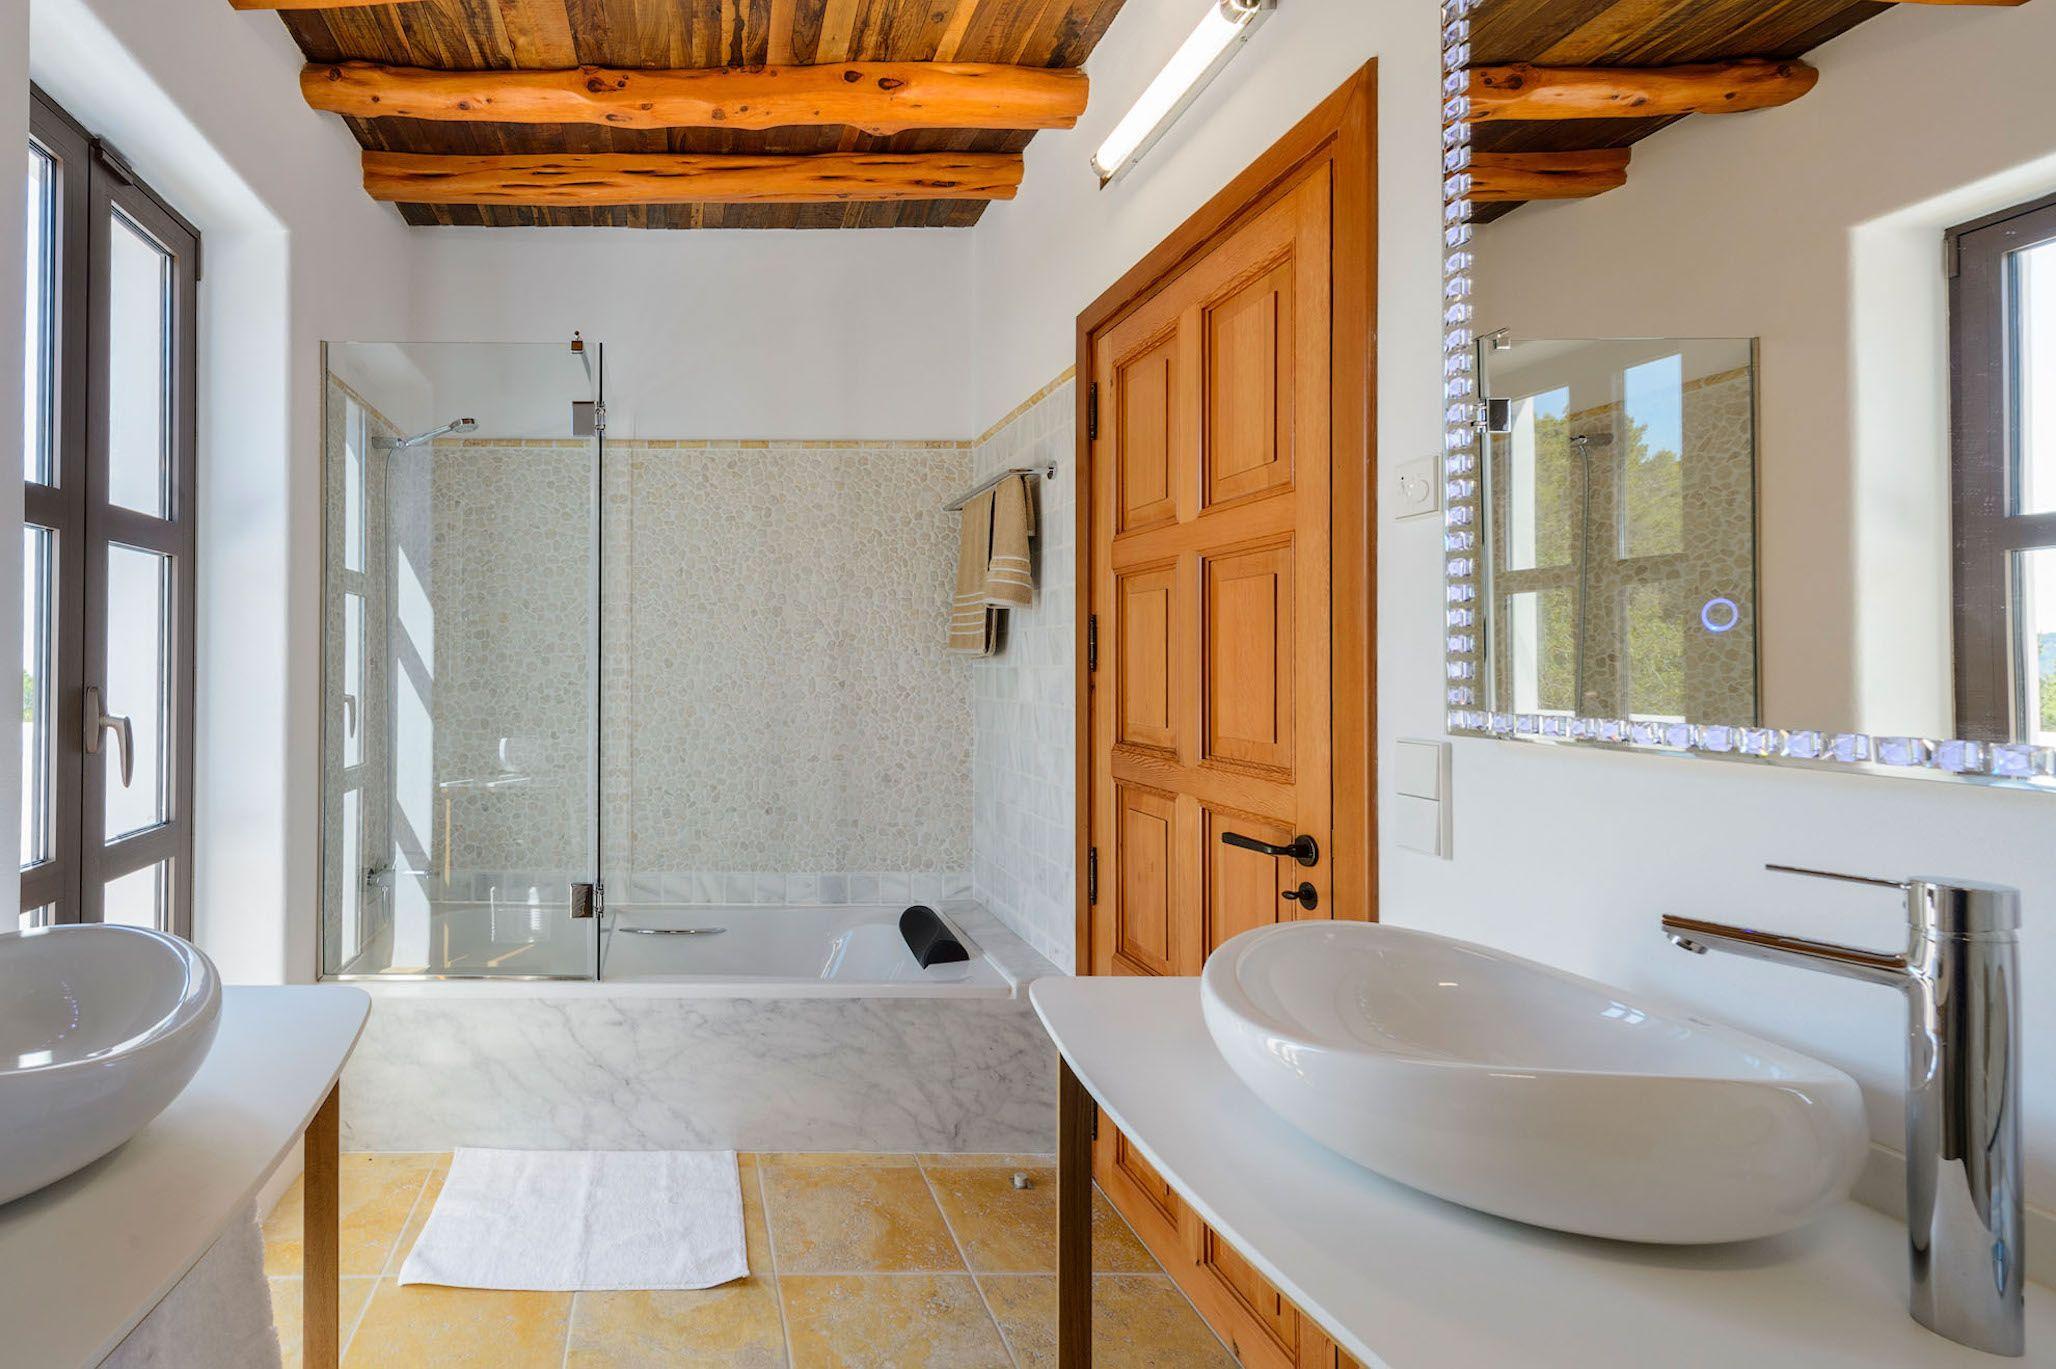 Celestial Villa Ibiza, near Santa Eularia in Ibiza, family villa in Ibiza